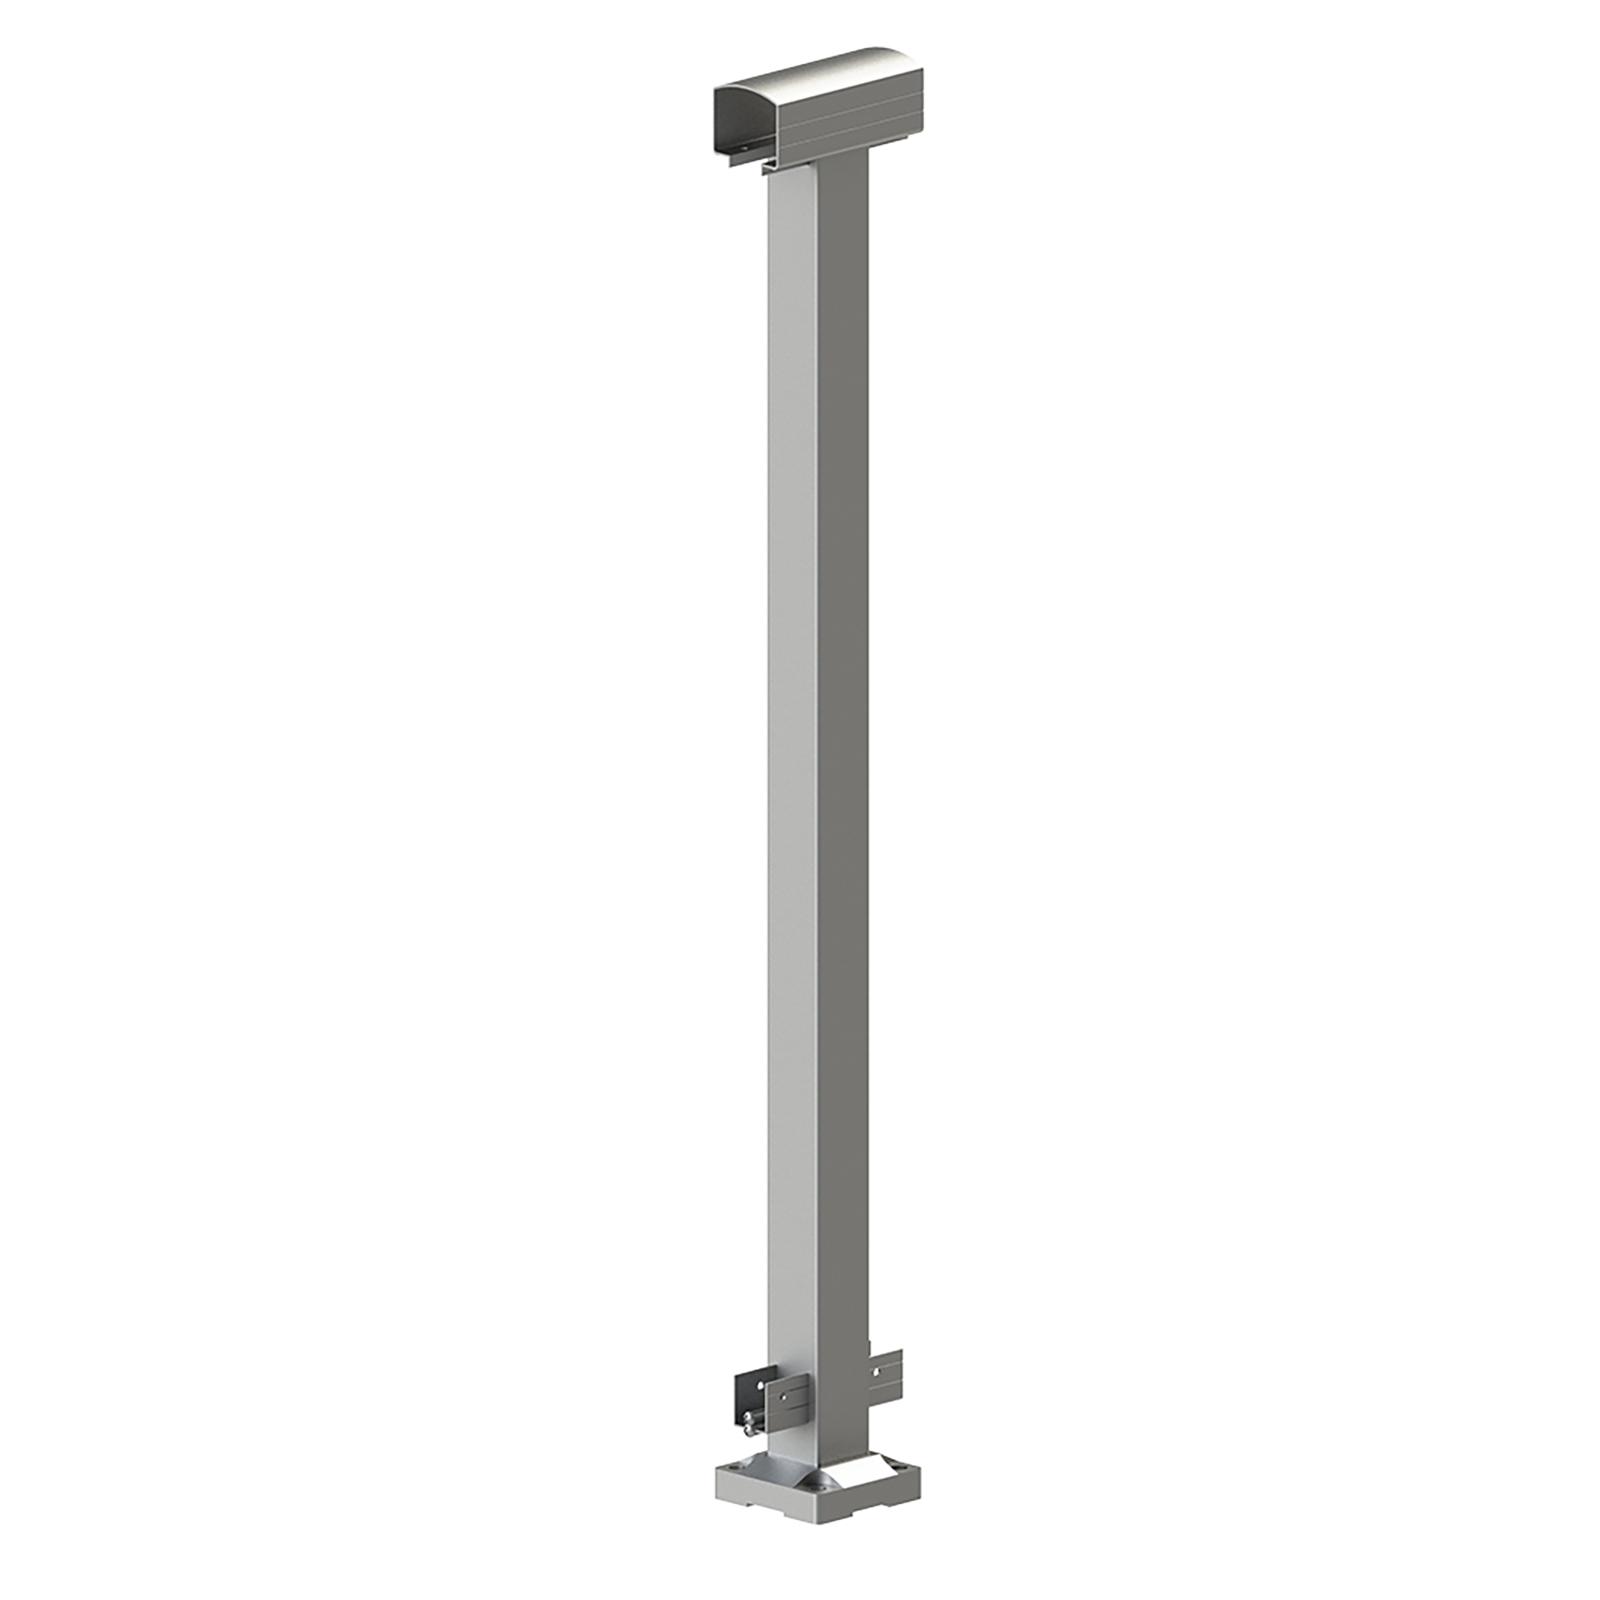 Peak Products 1000mm Silver Aluminium Balustrade Mid Post